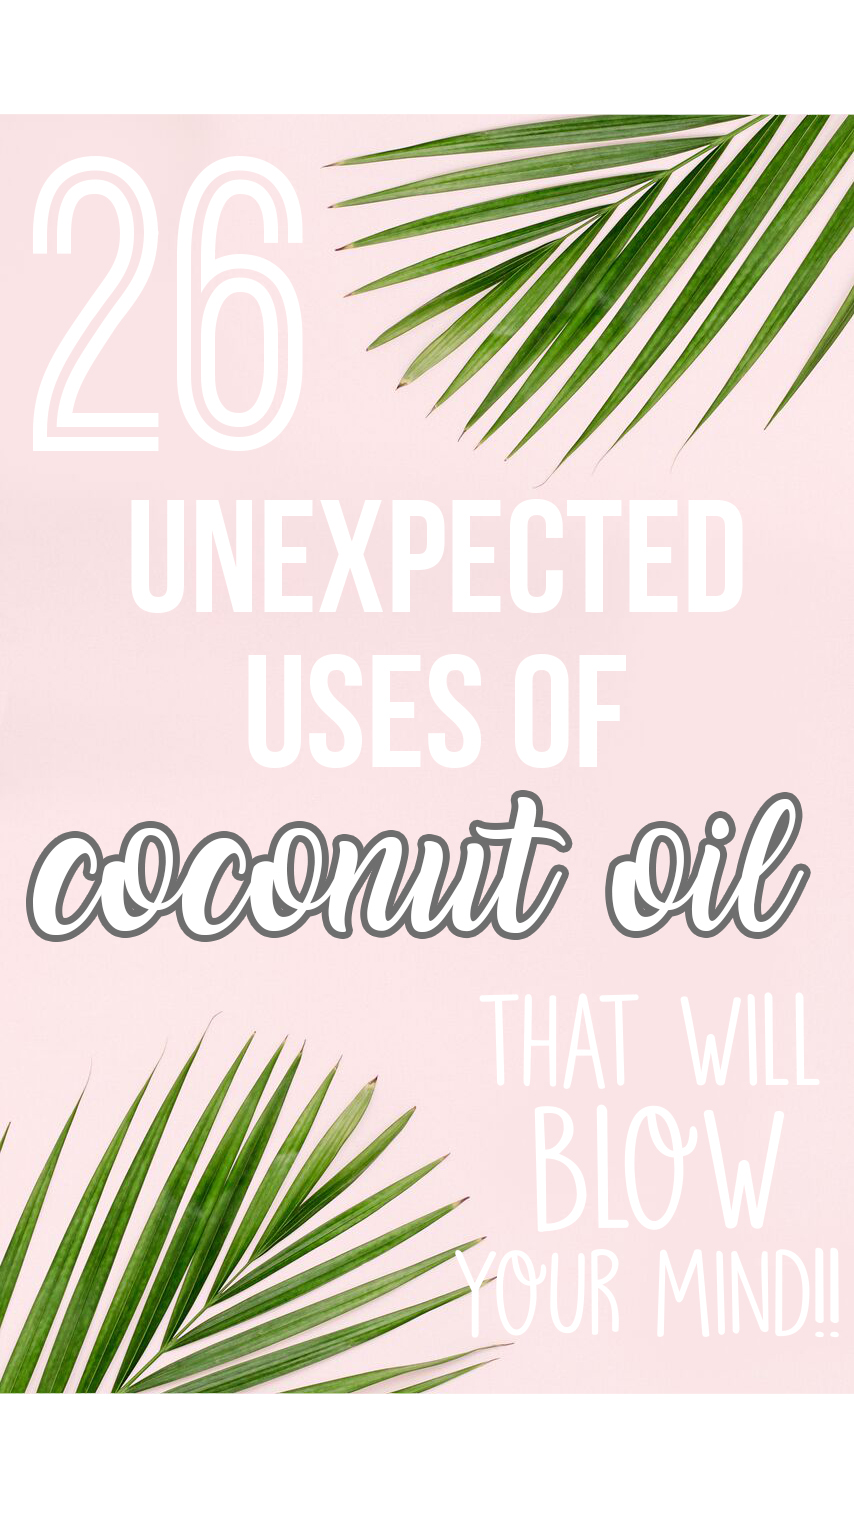 26 unexpected uses of coconut oil || health remedies, life hacks, alternatives, health benefits || Nikki's Plate www.nikkisplate.com